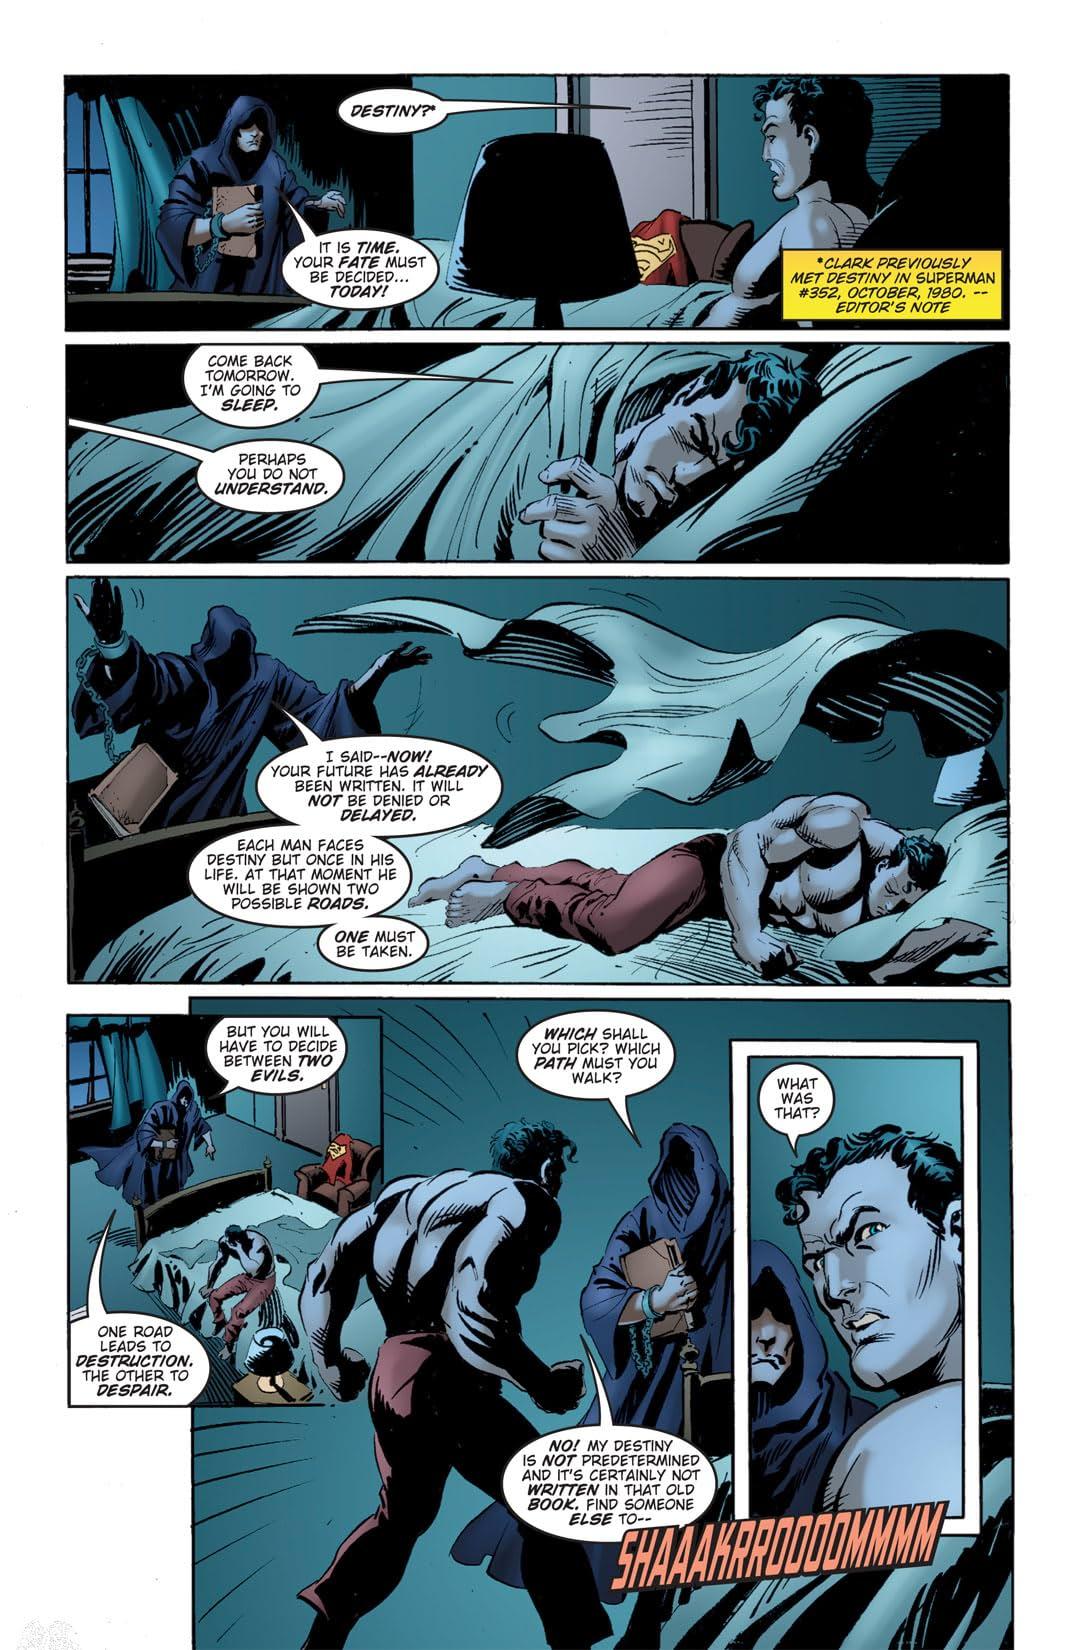 DC Retroactive: Superman - the 80s #1